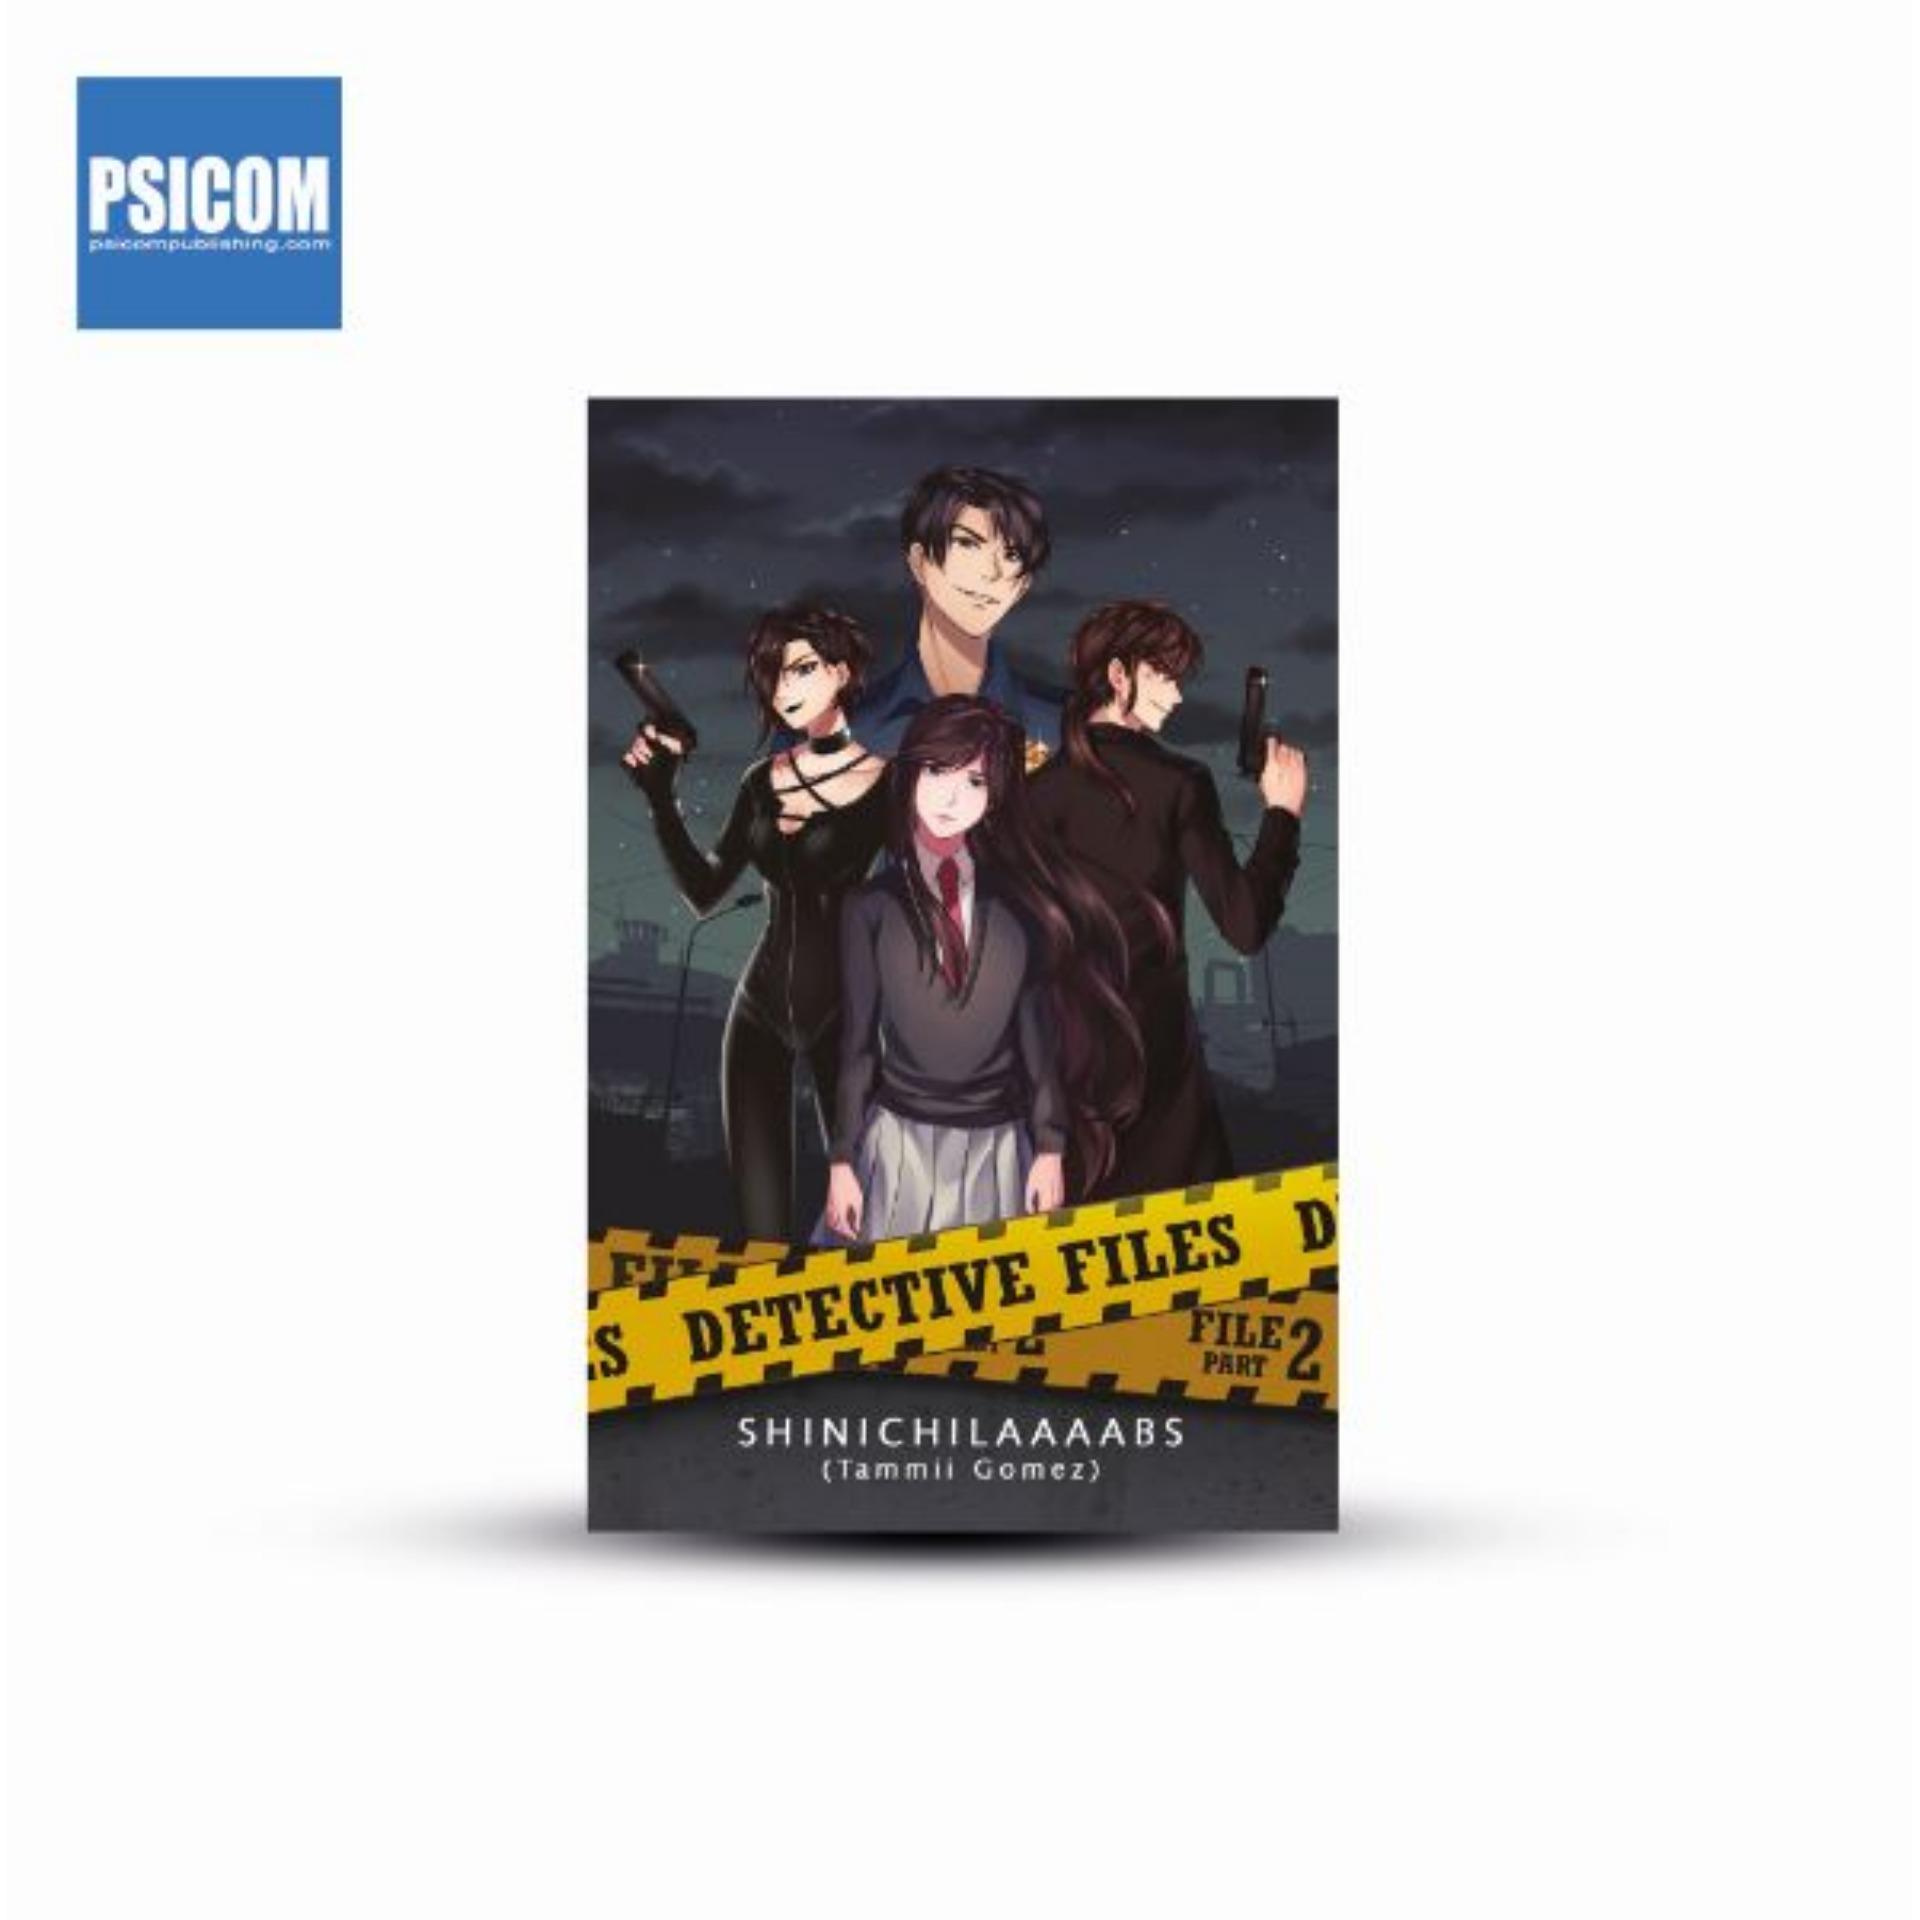 Detective Files File 2 Part 2 by ShinichiLaaaabs (Wattpad / PSICOM)